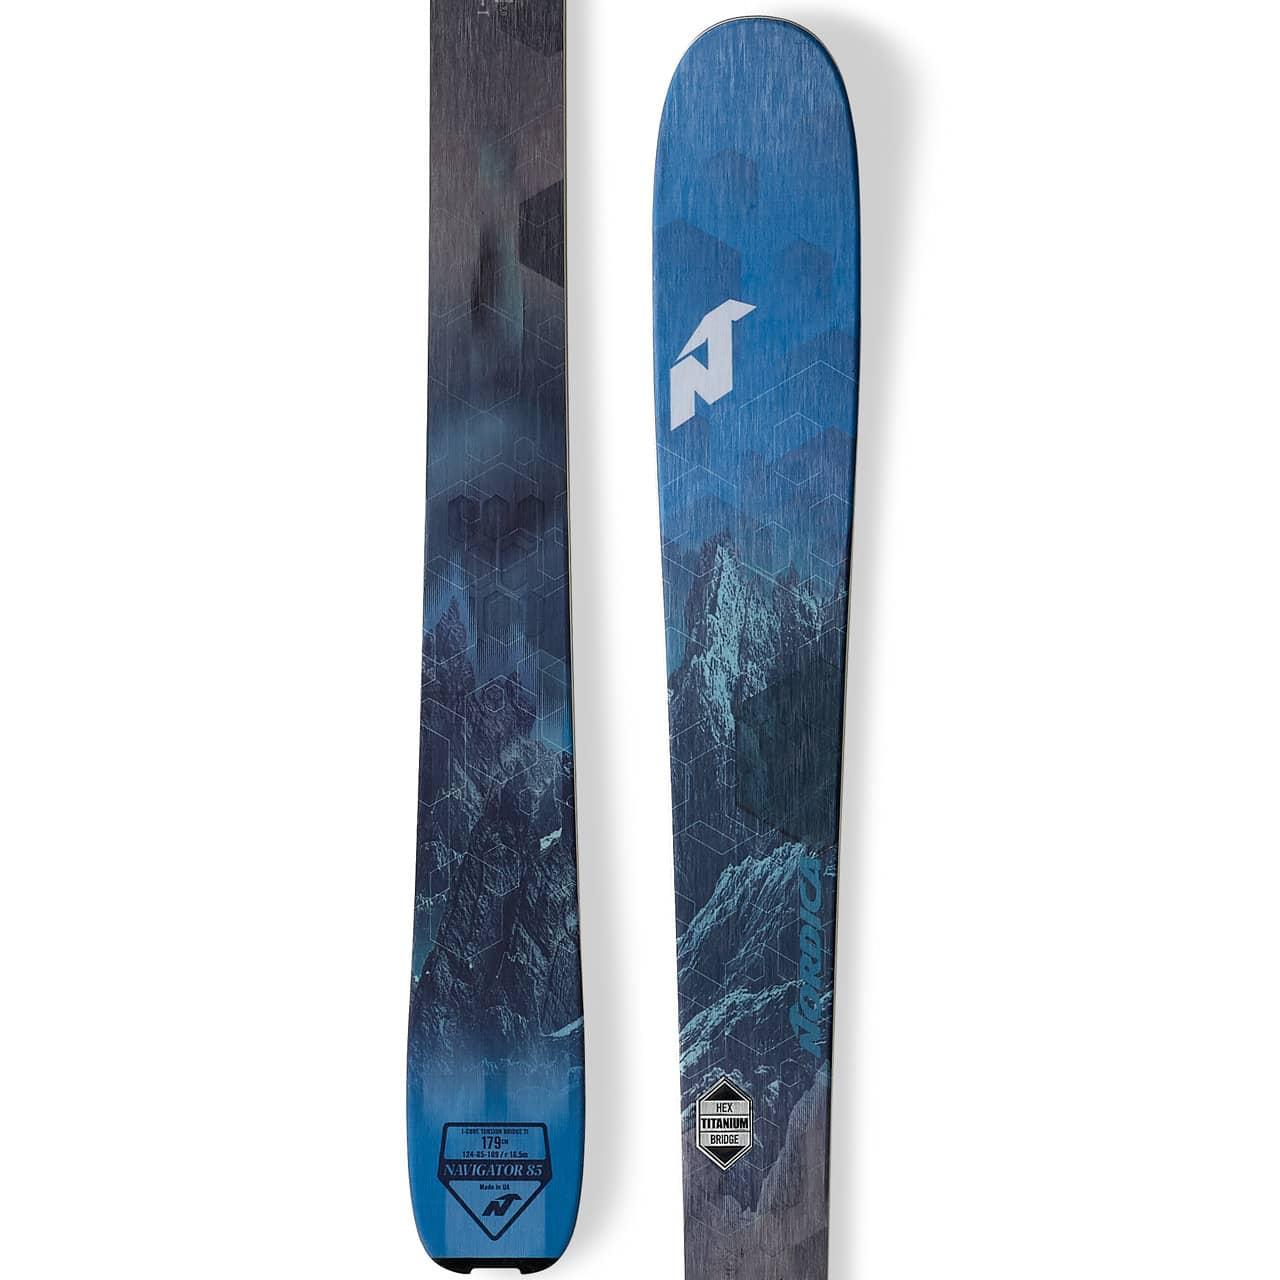 nordica all mountain ski allround ski g nstig online kaufen. Black Bedroom Furniture Sets. Home Design Ideas